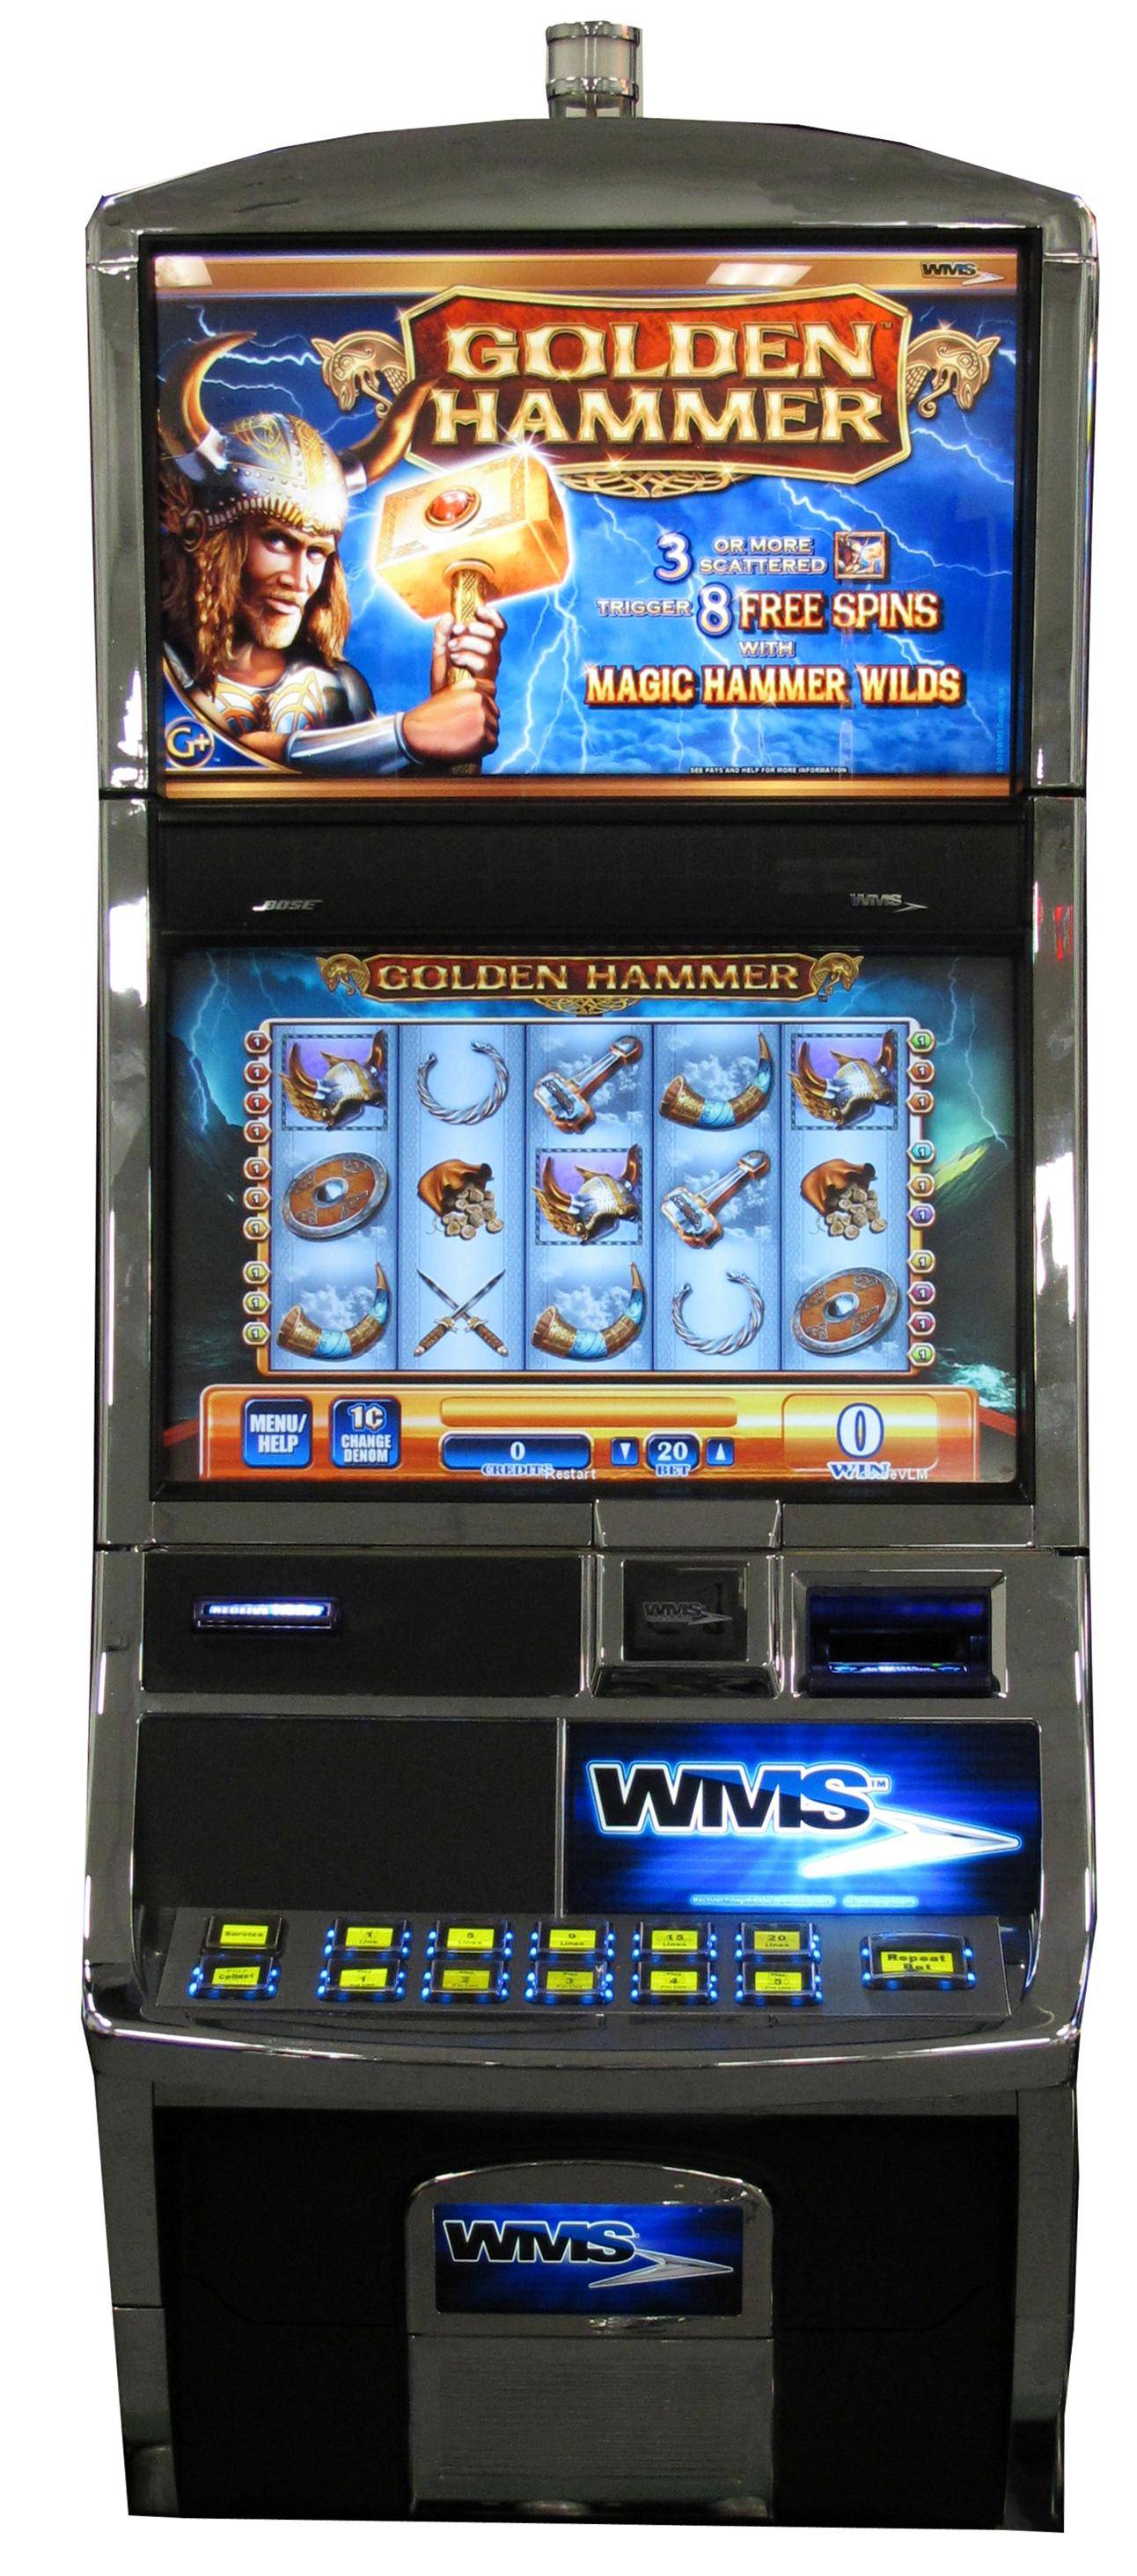 WMS BlueBird 2 used slot